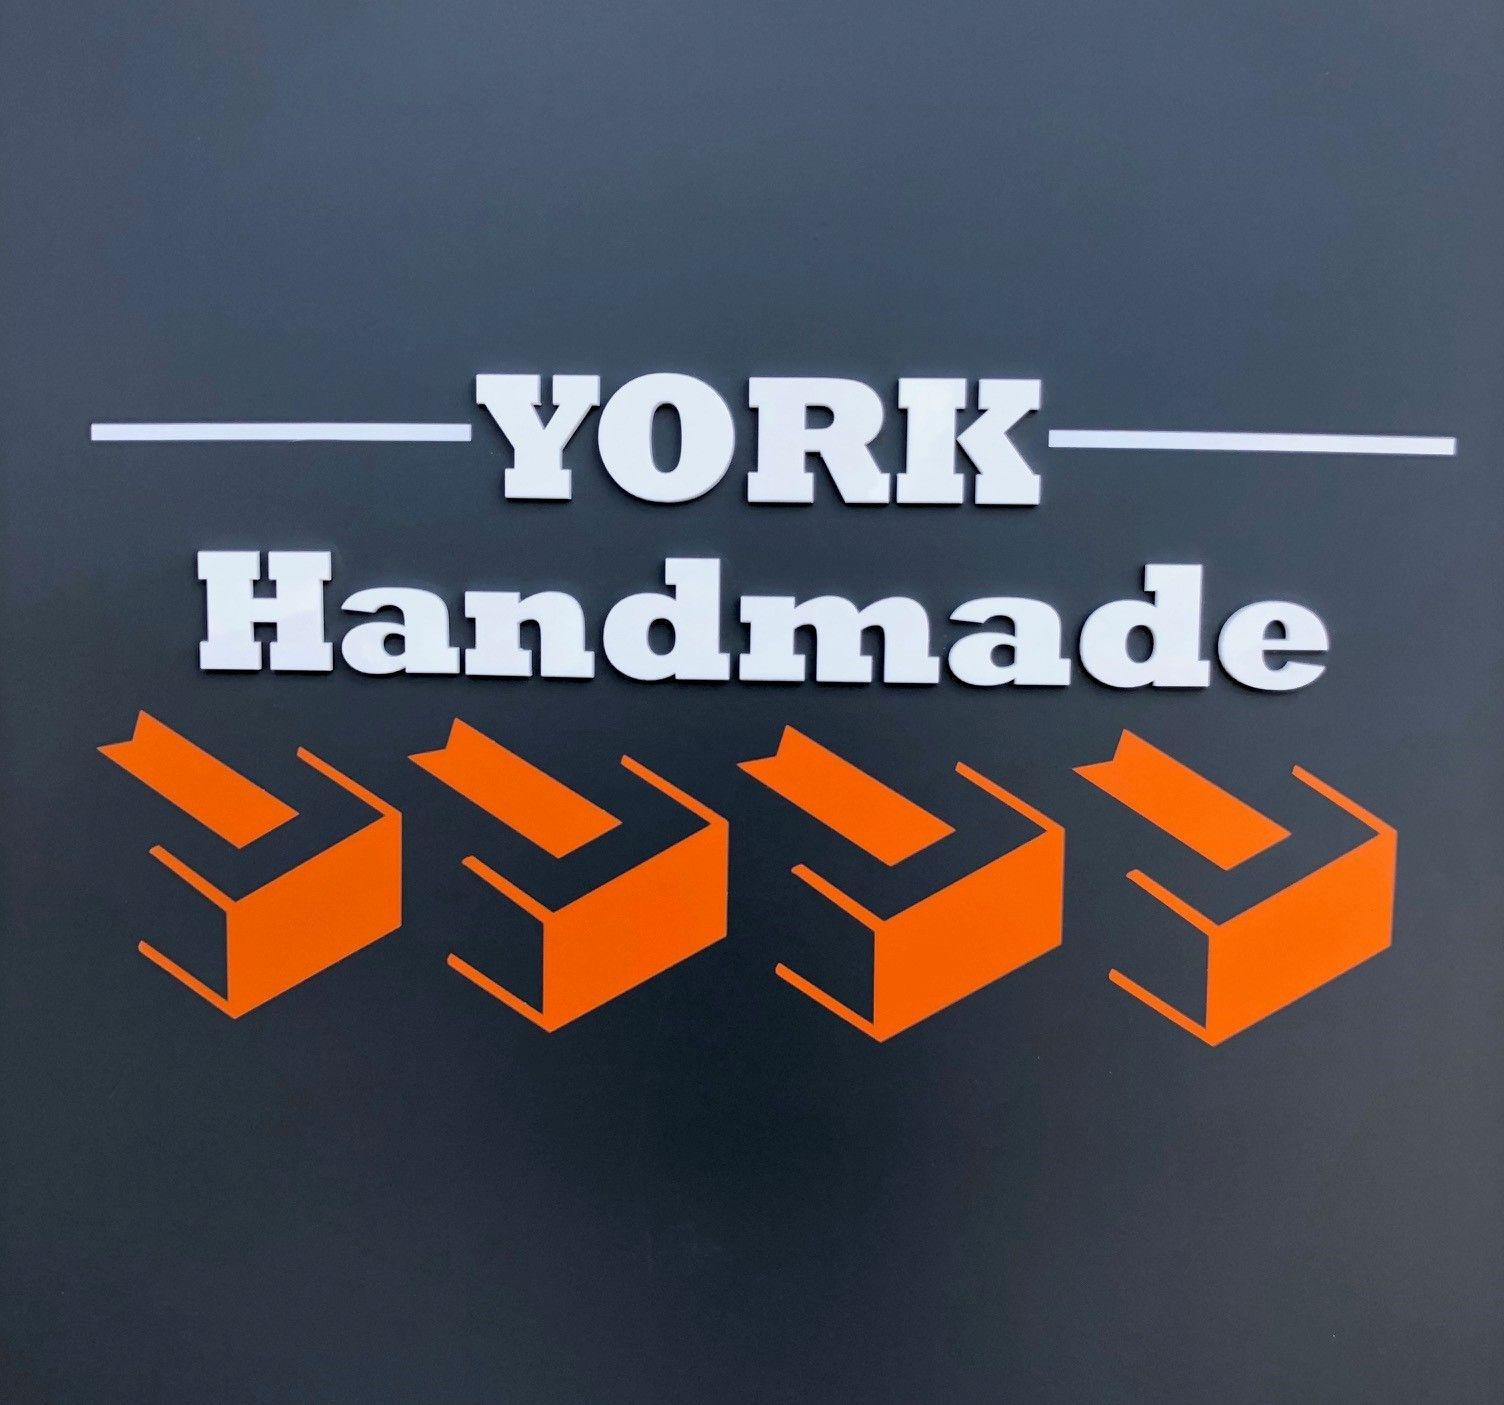 York Handmade Brick